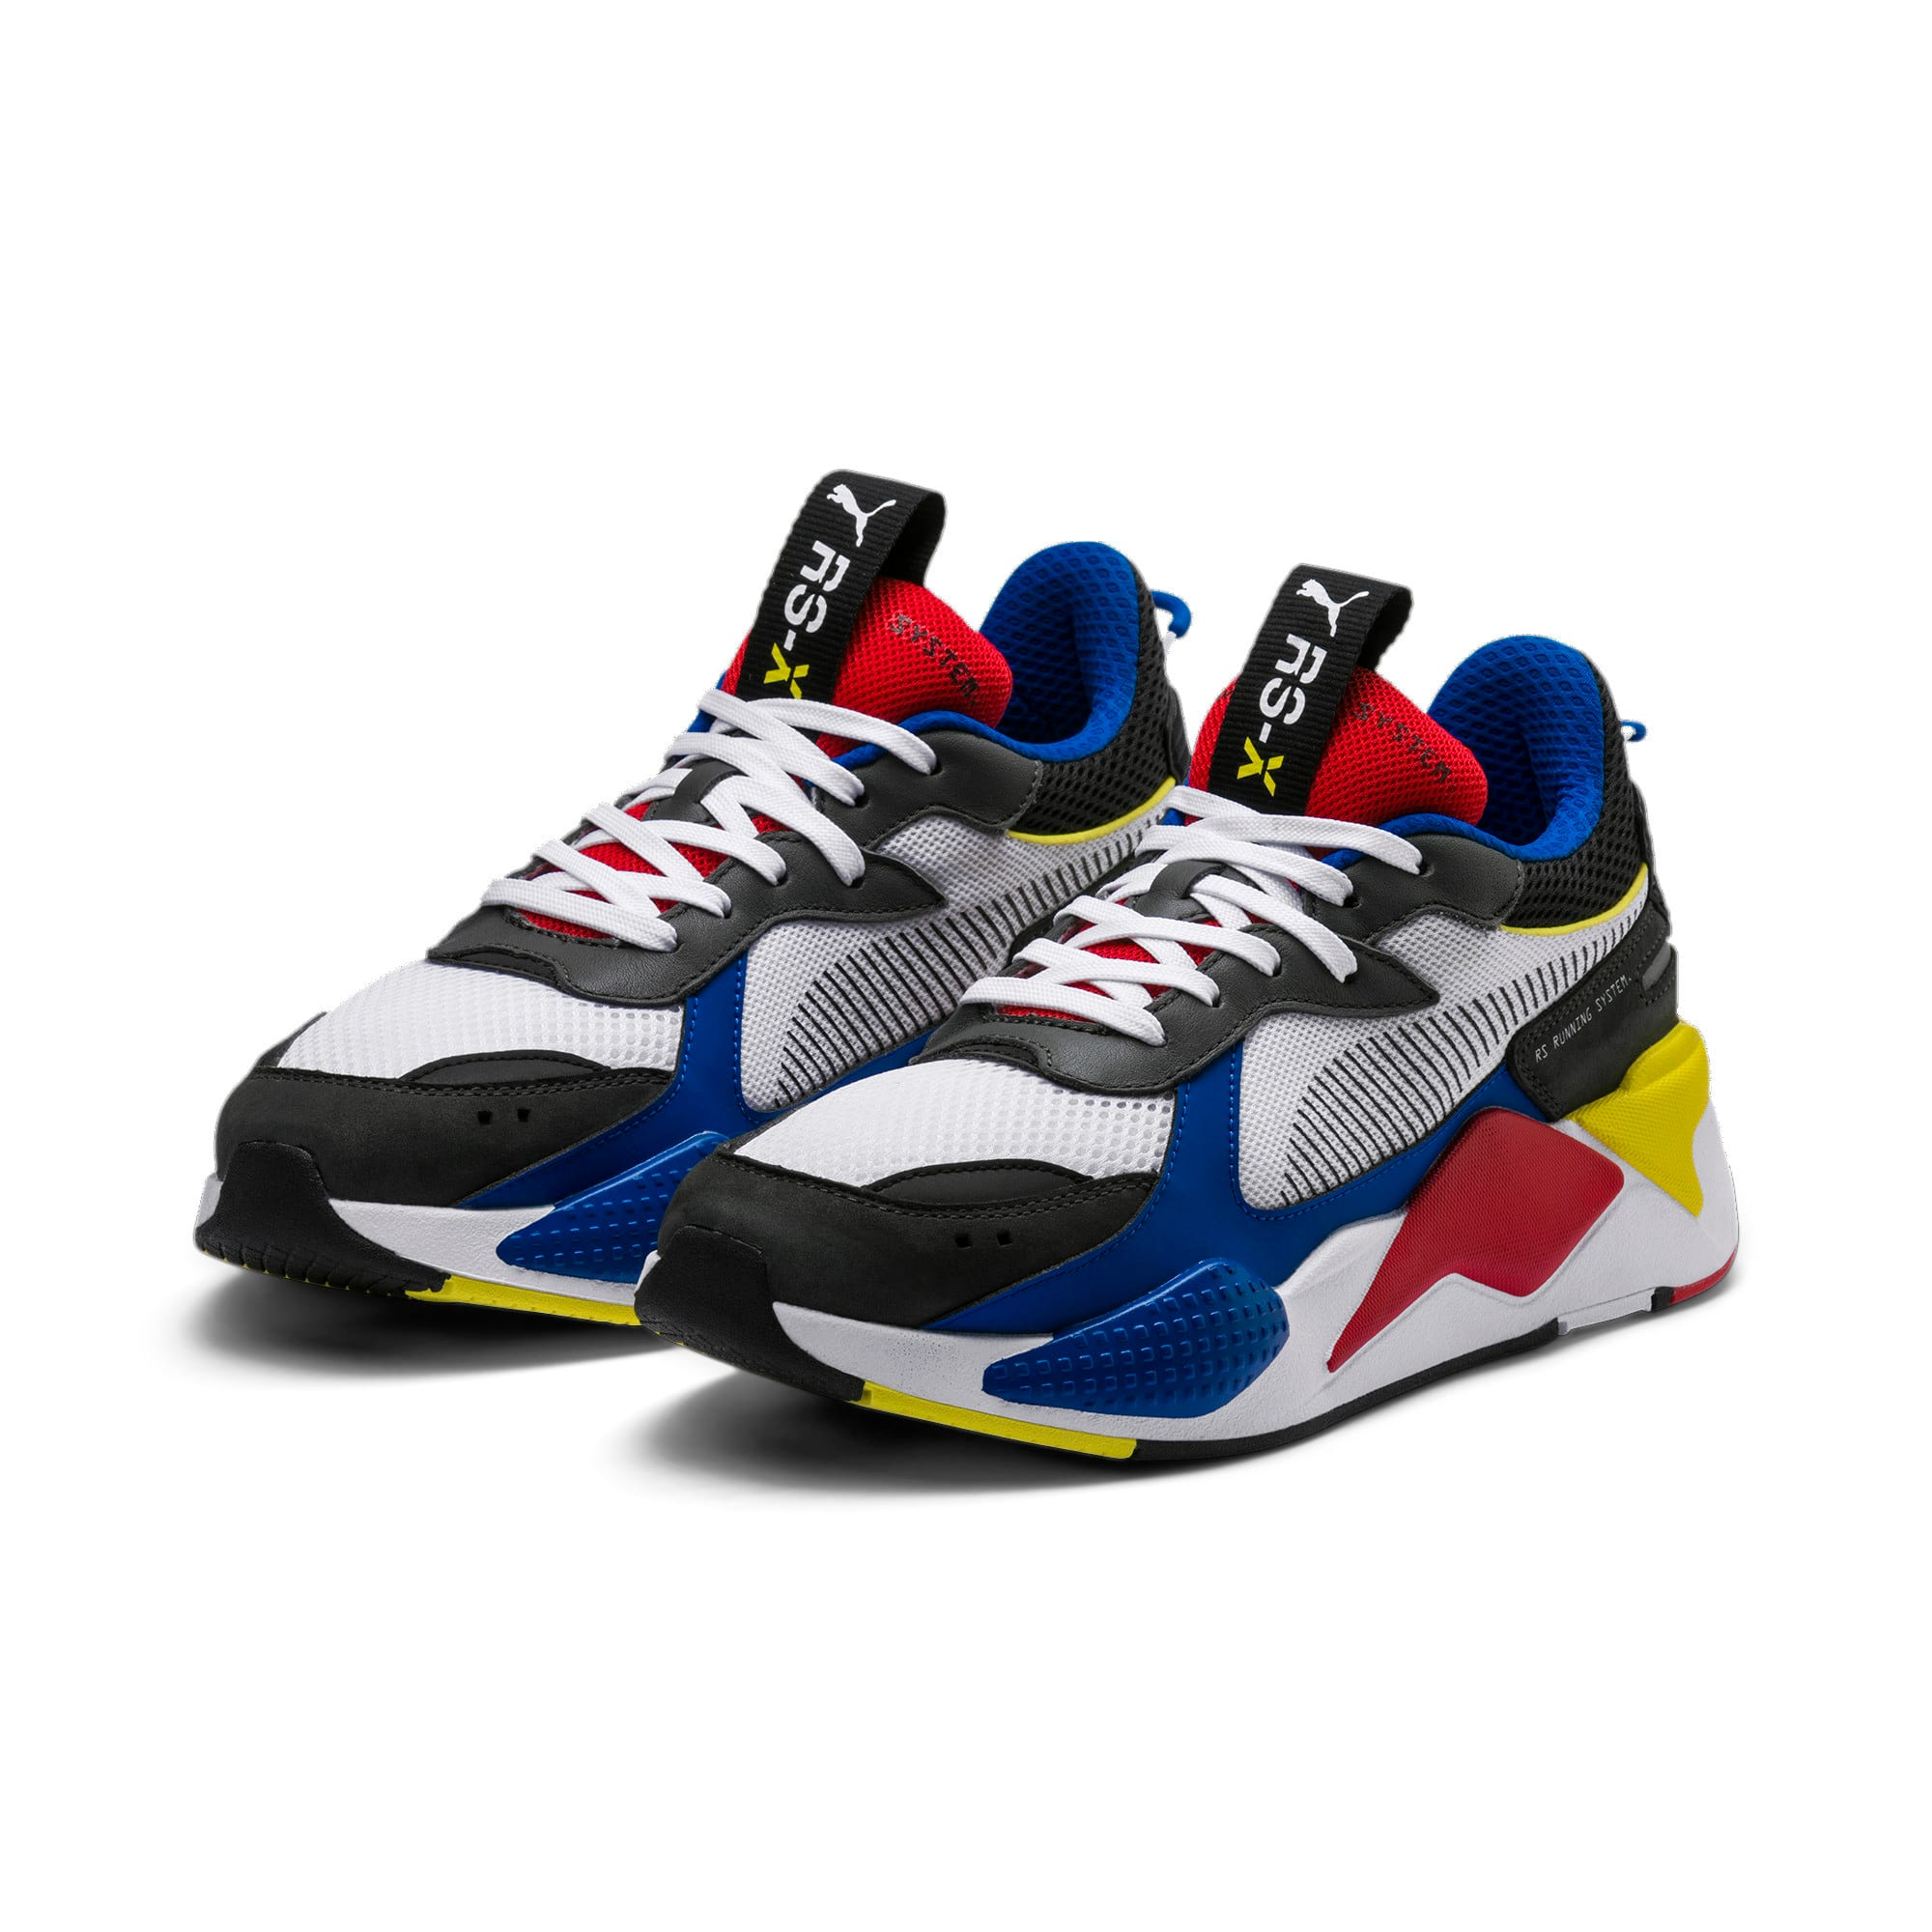 Thumbnail 4 of RS-X Toys Sneakers, Puma White-Puma Royal, medium